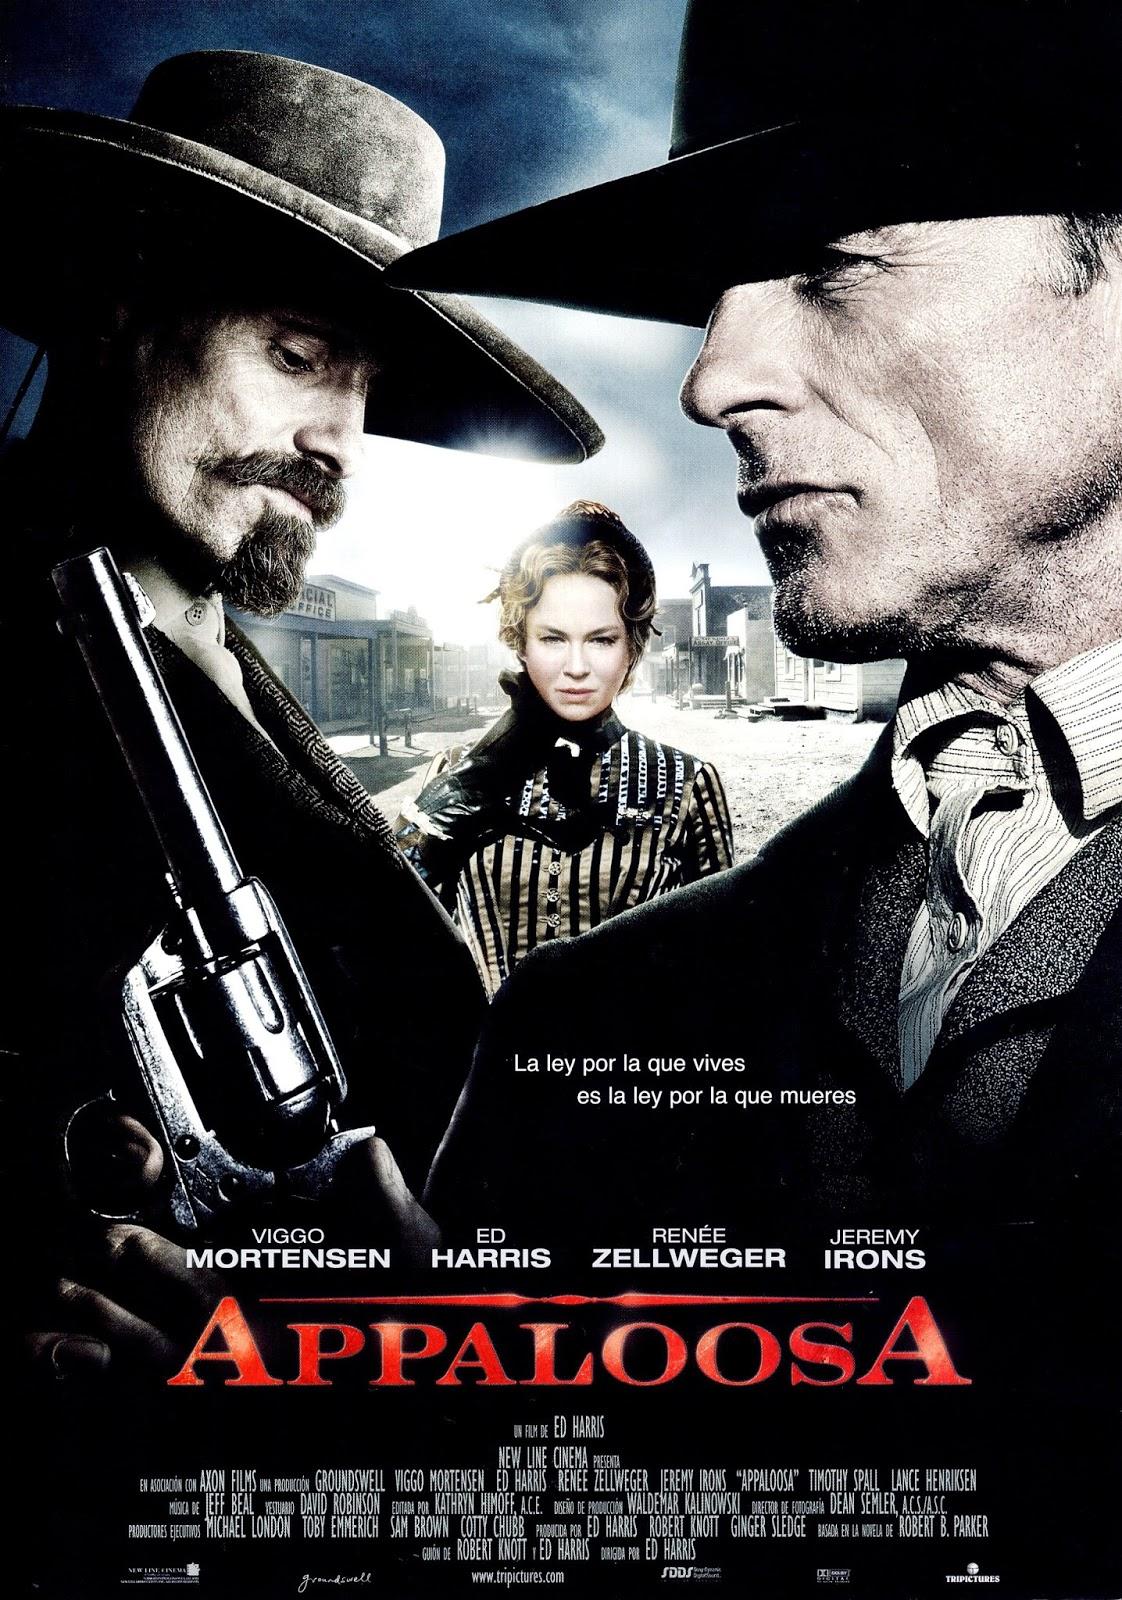 Appaloosa (2008) คู่ปืนดุล้างเมืองบาป : พากษ์ไทยNUNGCOWBOY ...